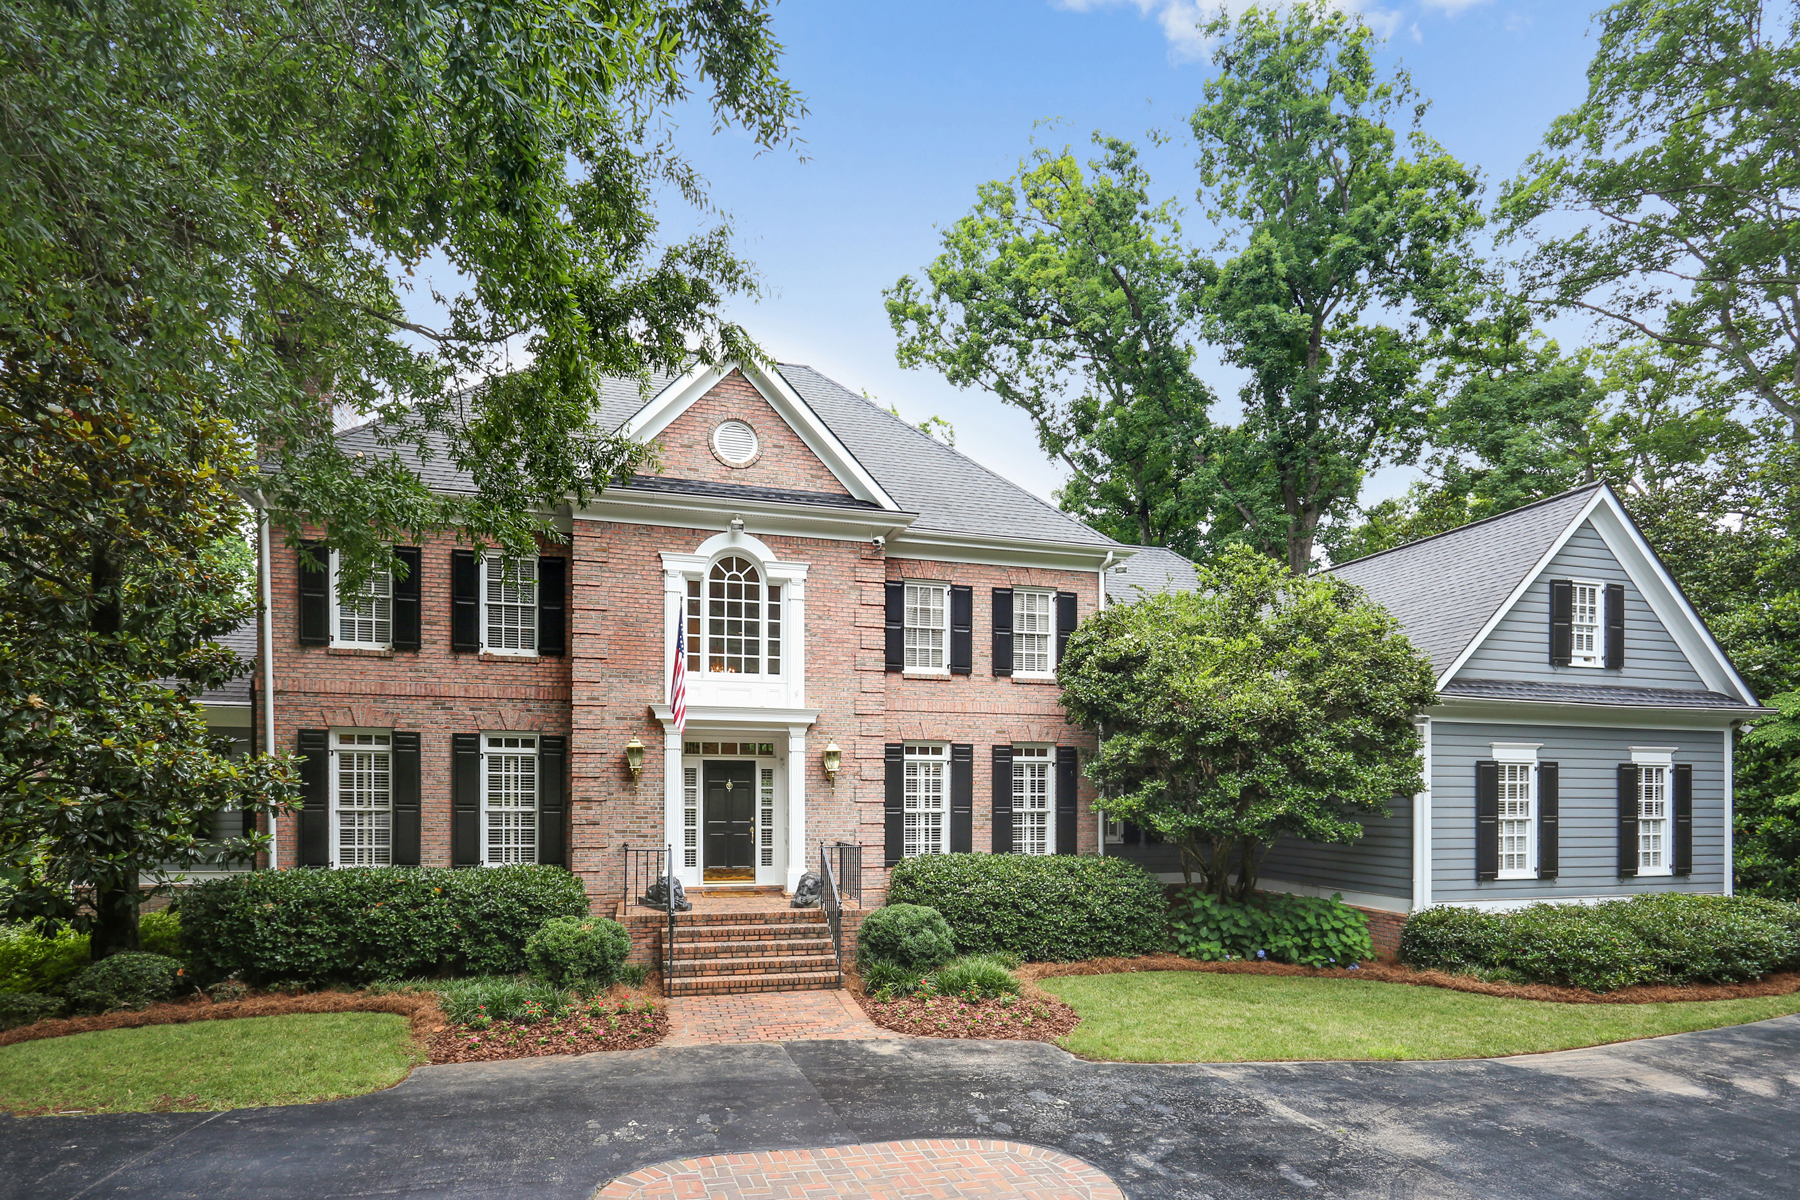 Single Family Home for Sale at Quiet Cul-de-sac In Tuxedo Park 89 Blackland Court NW Atlanta, Georgia 30342 United States